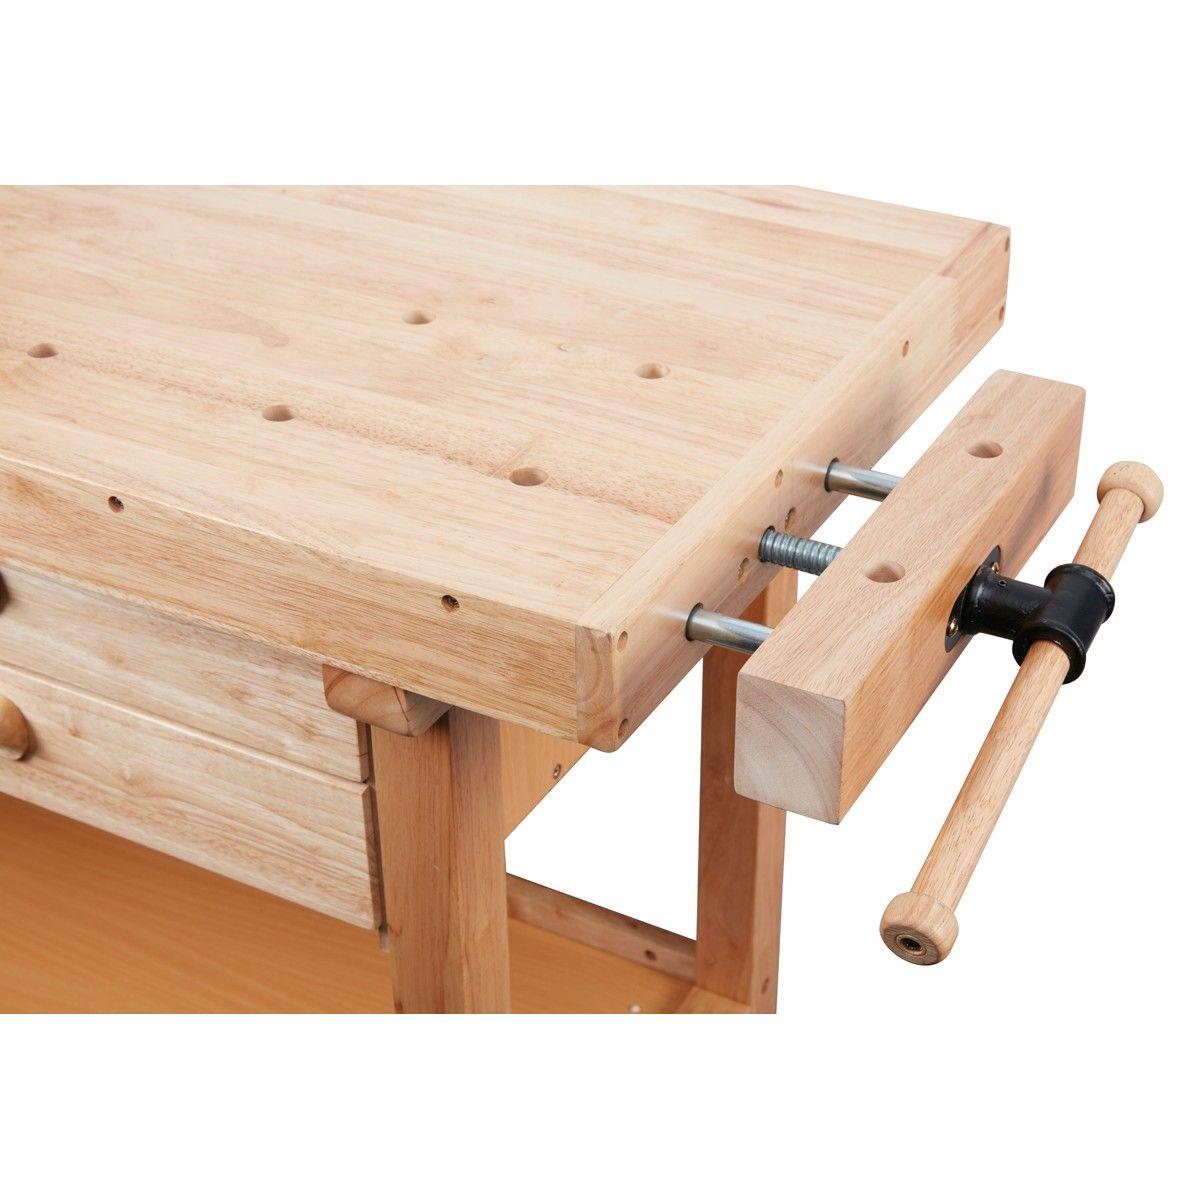 60 In 4 Drawer Hardwood Workbench Woodworking Workbench Diy Workbench Workbench Designs